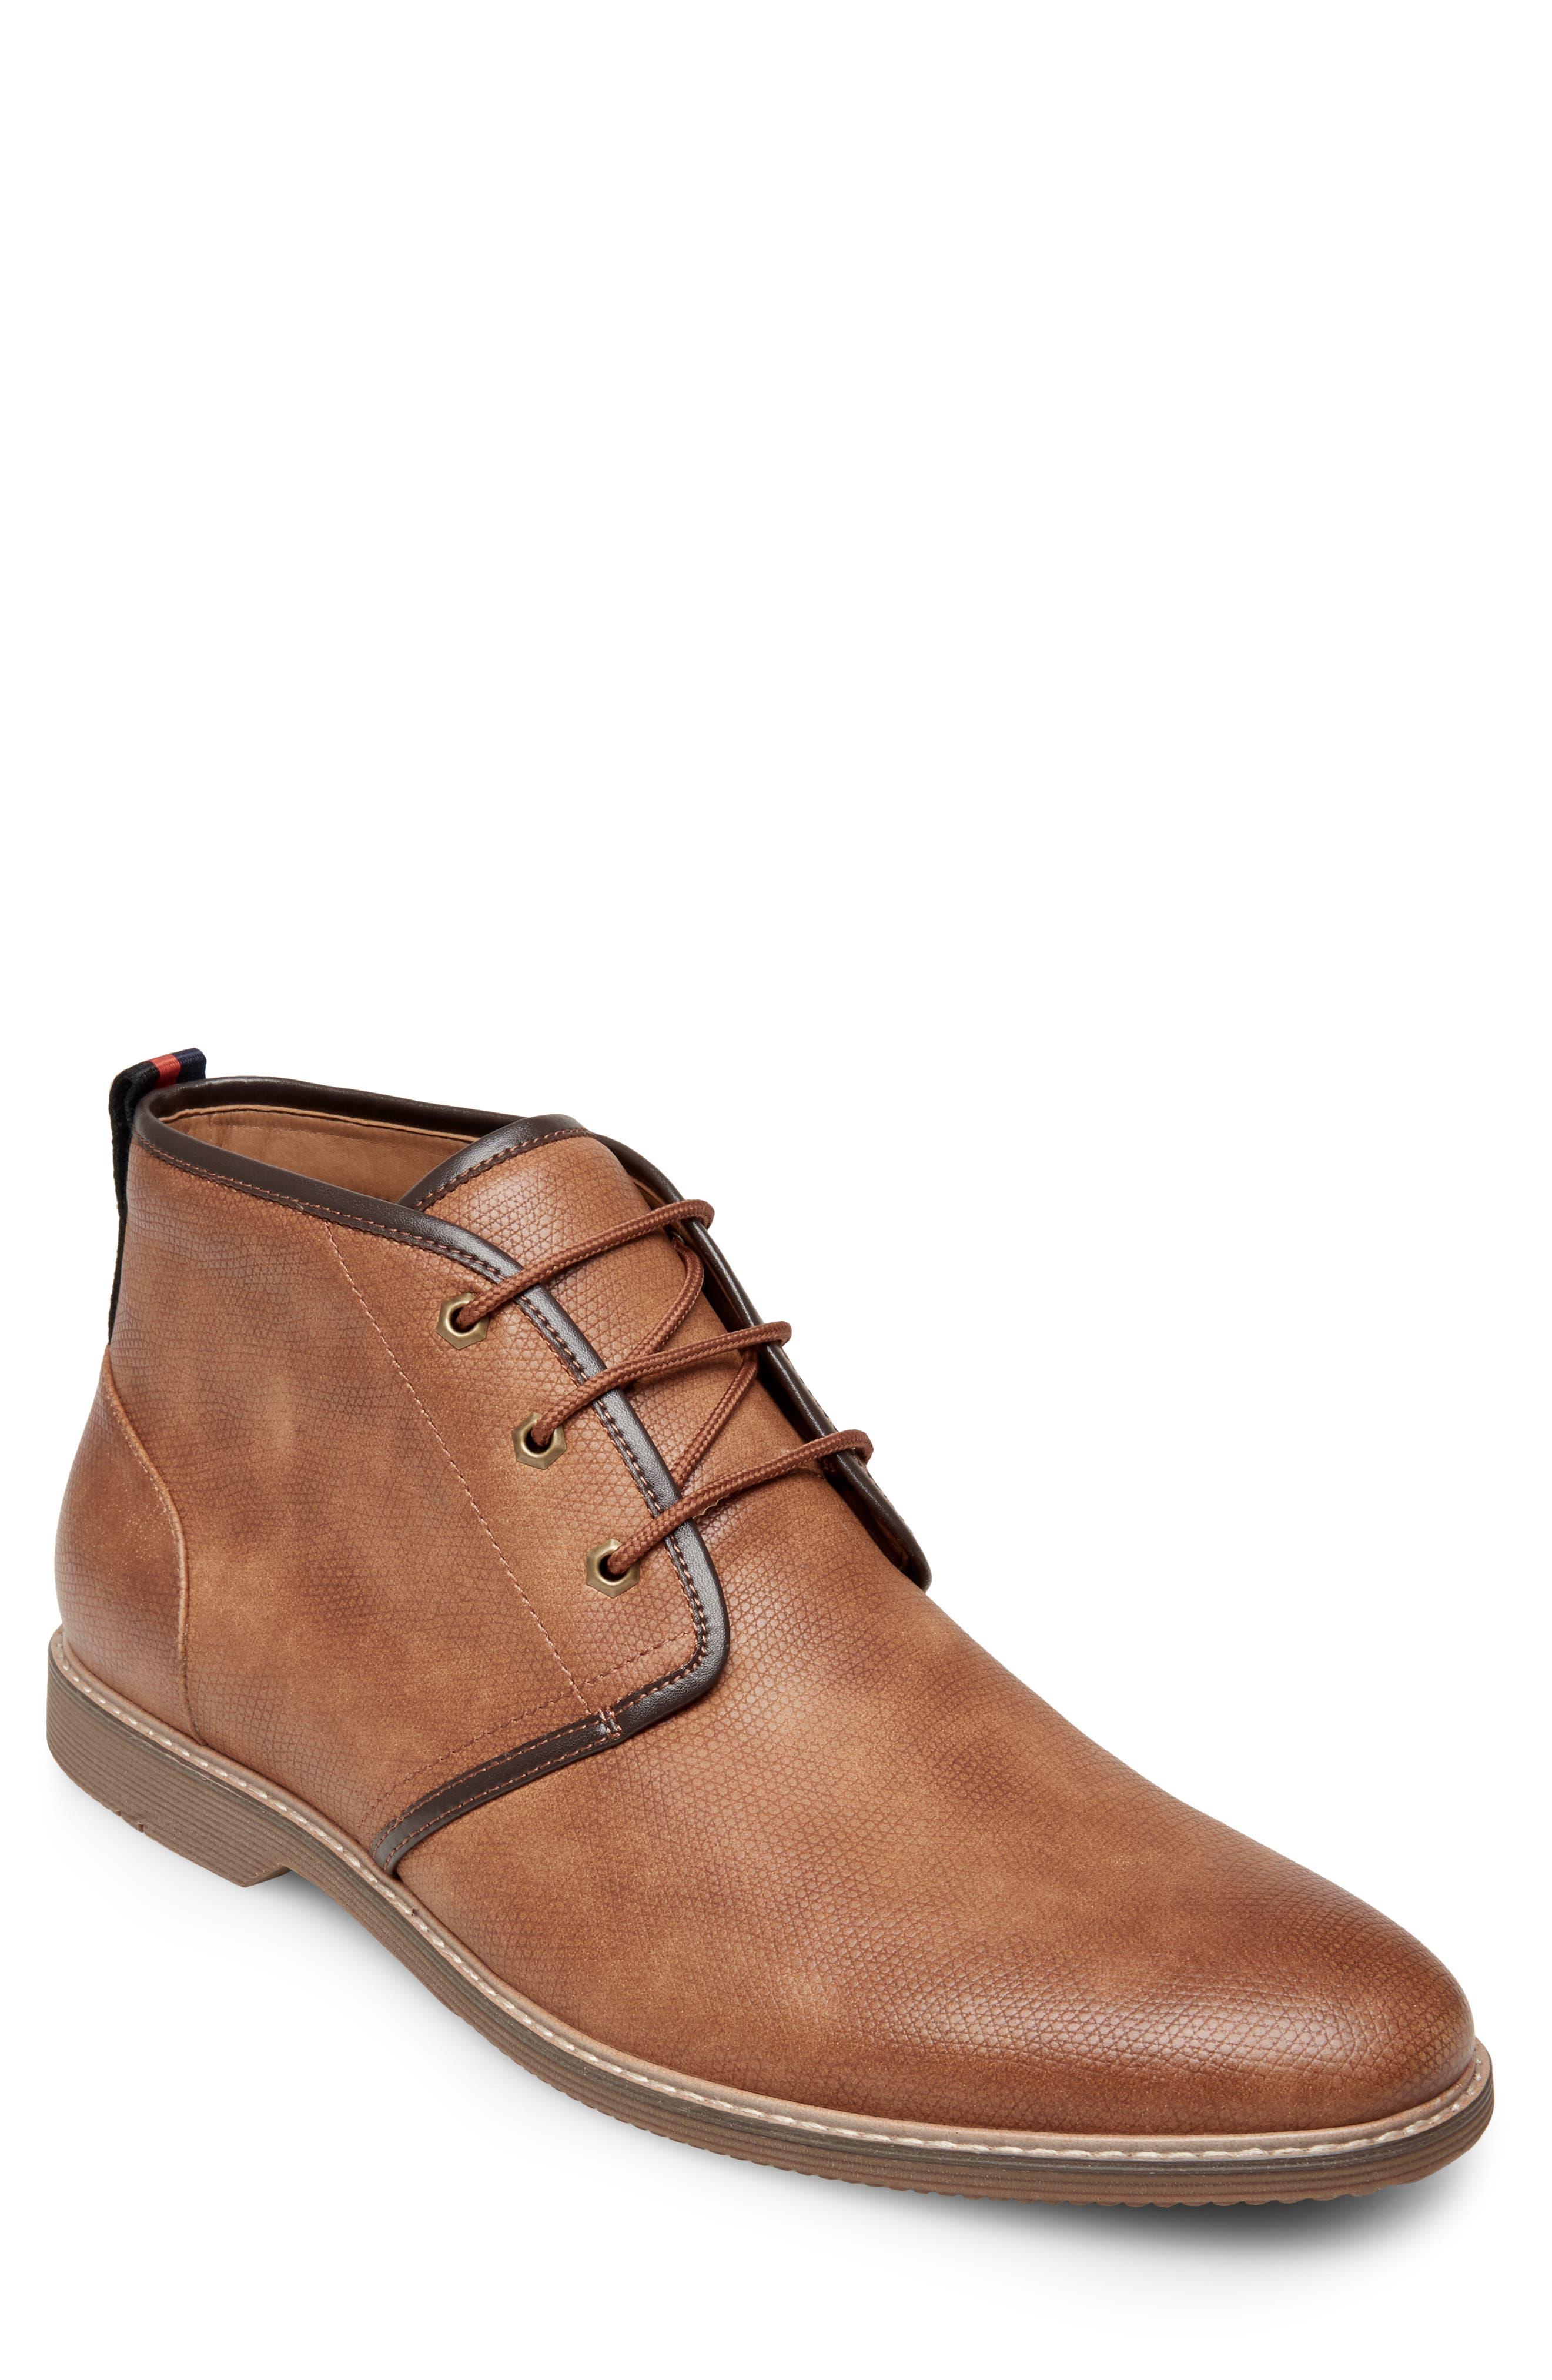 Steve Madden | Nurture Plain Toe Boot